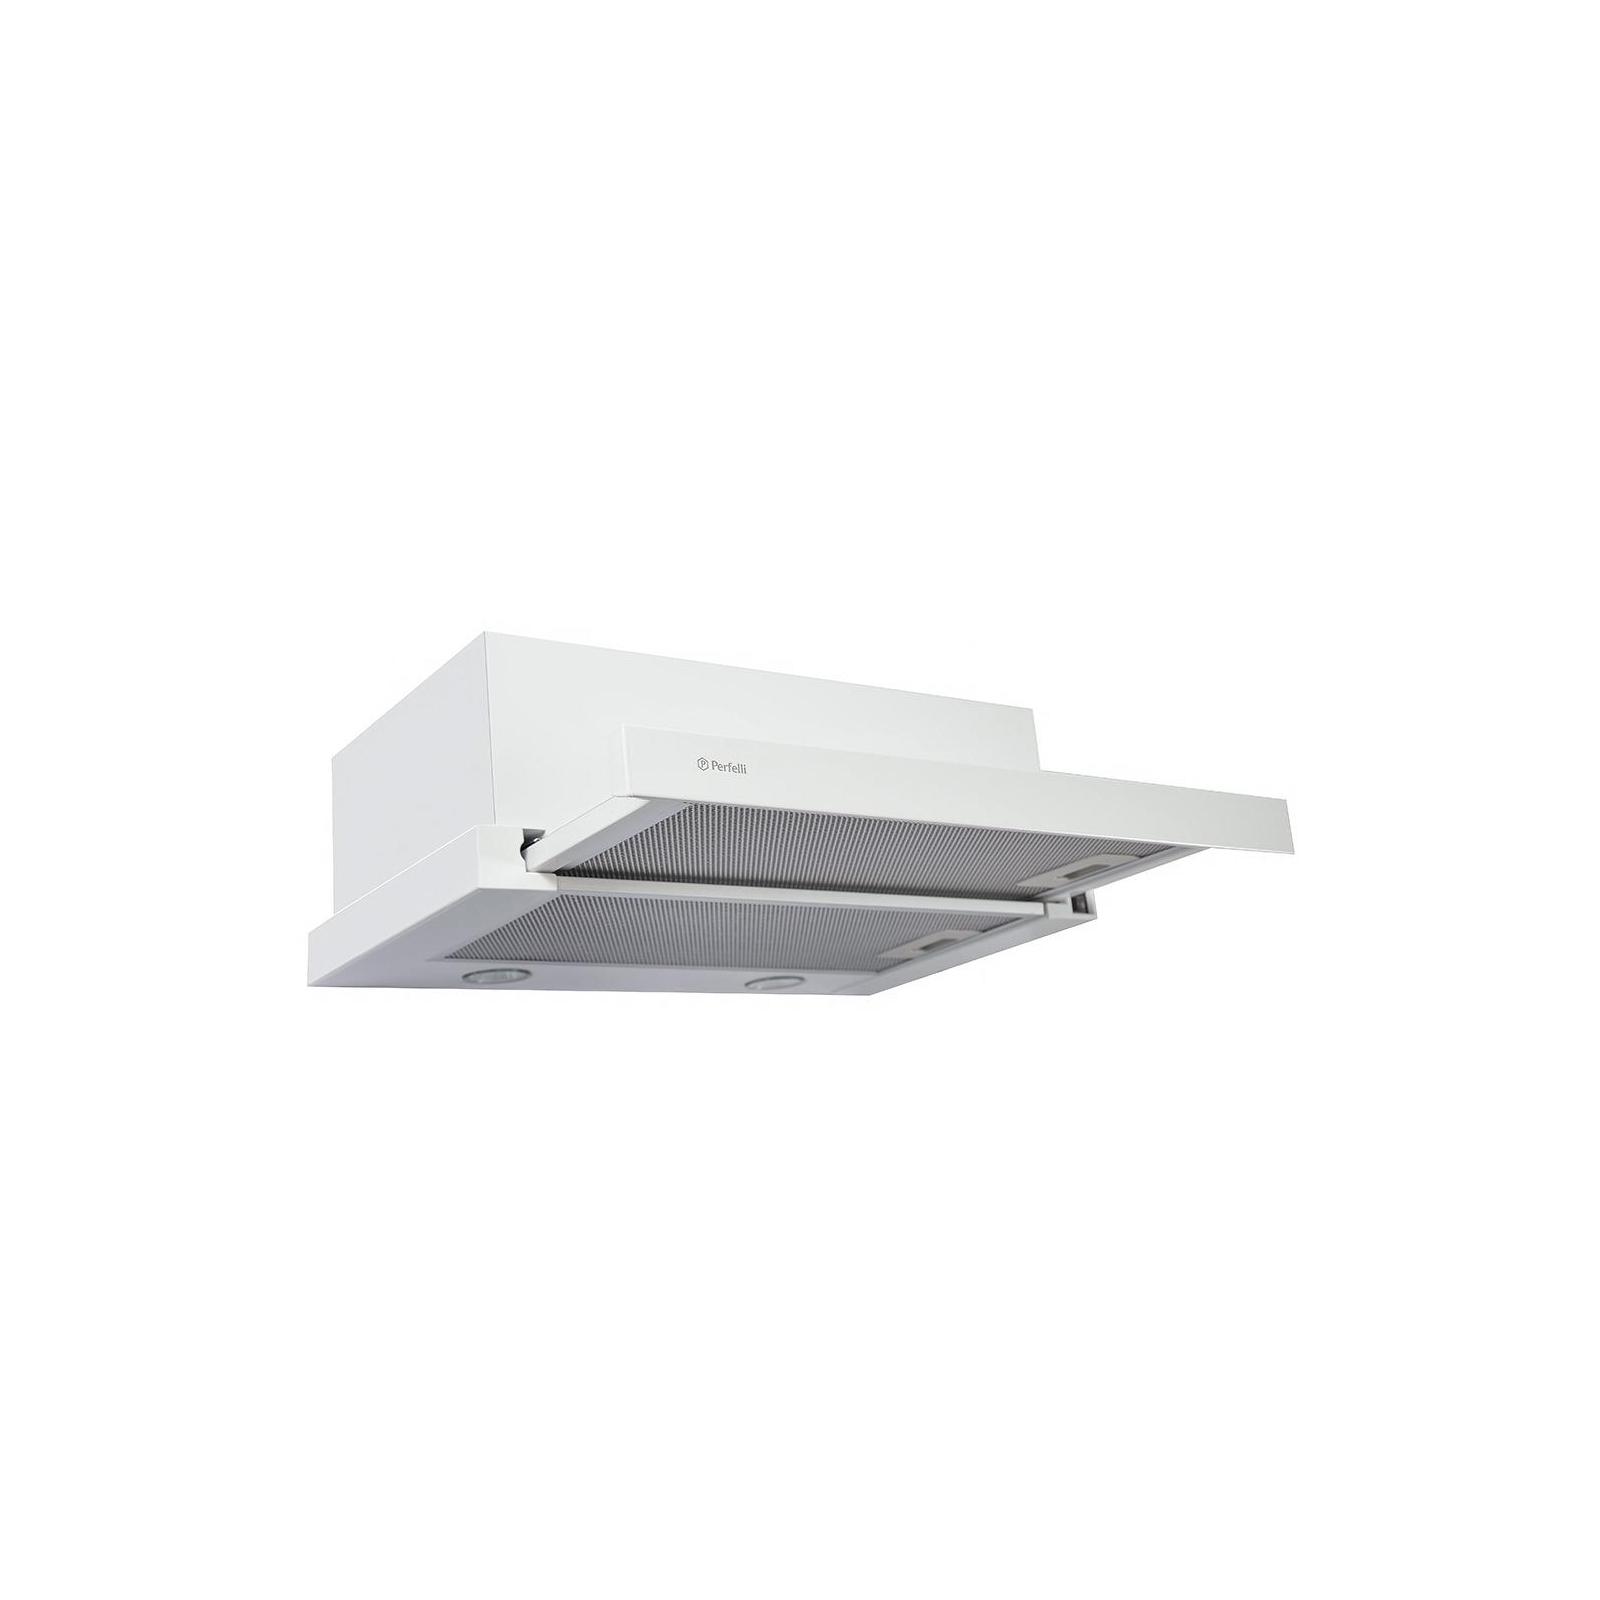 Вытяжка кухонная Perfelli TL 6112 IV LED изображение 2